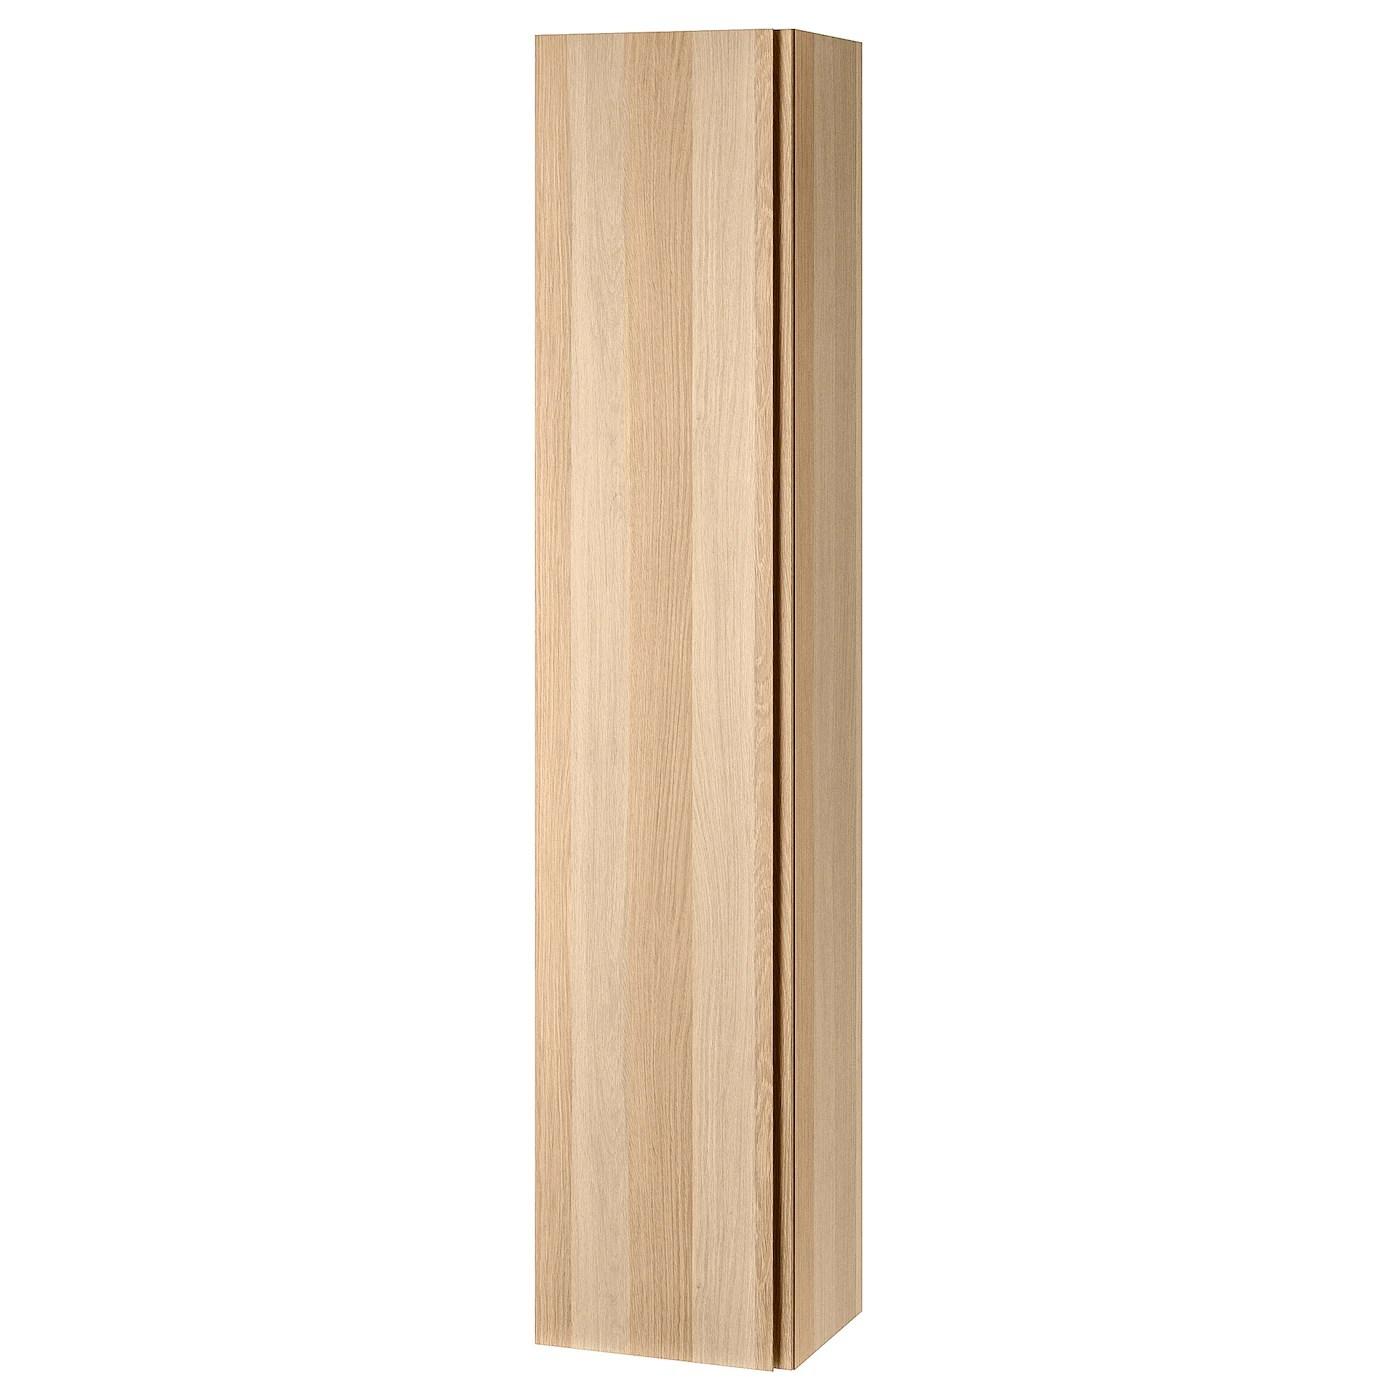 Meubles Rangement Salle De Bain Ikea